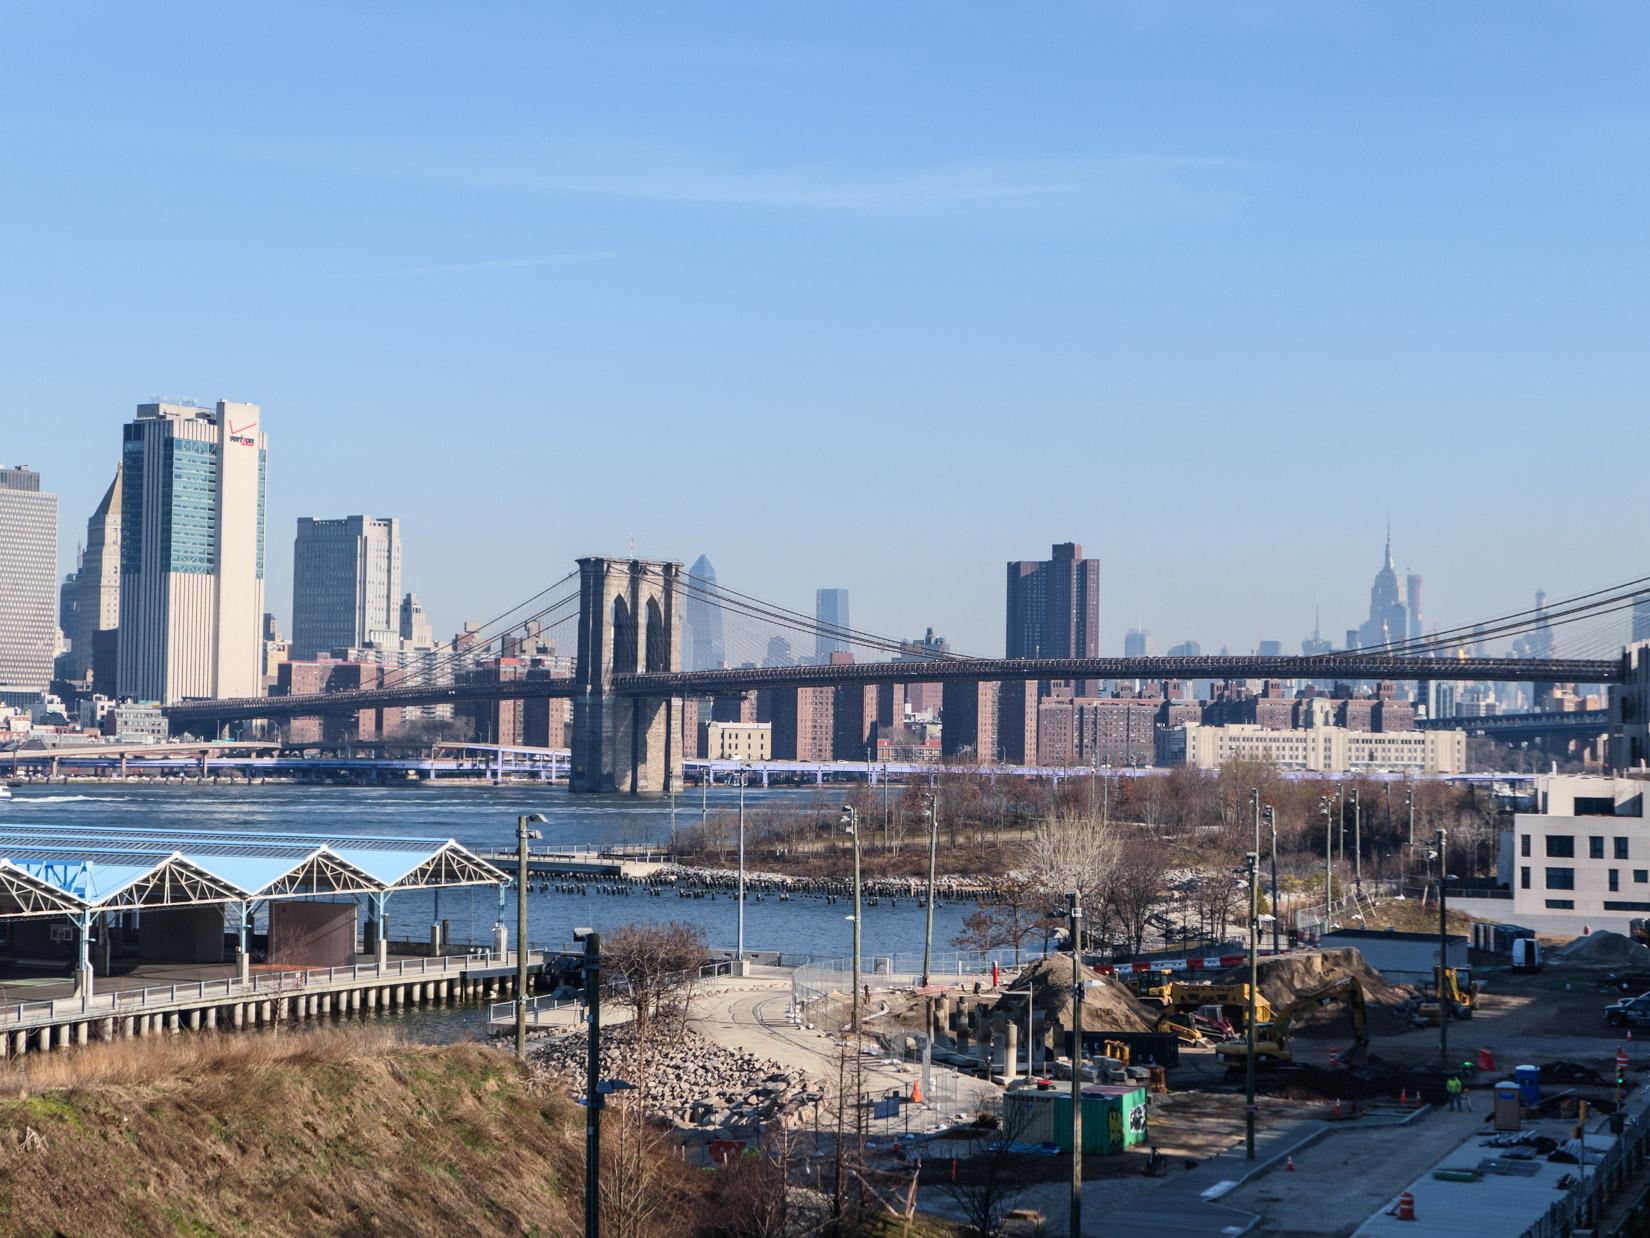 City Buildings and Bridge – MMT